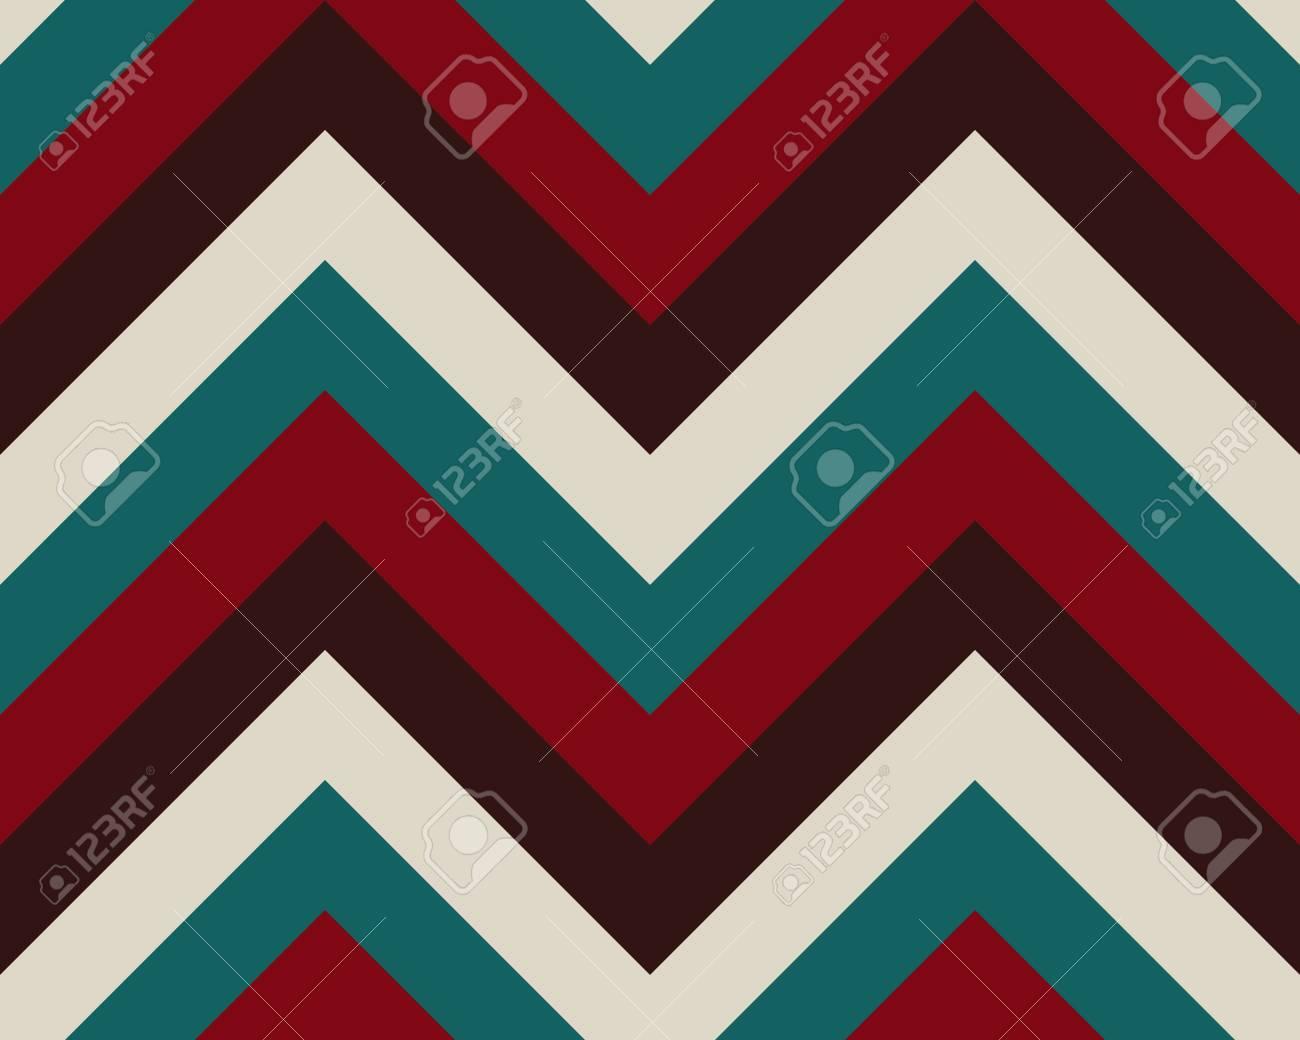 Zigzag line drawing : Striped zigzagging seamless pattern. zig zag line texture. stripy